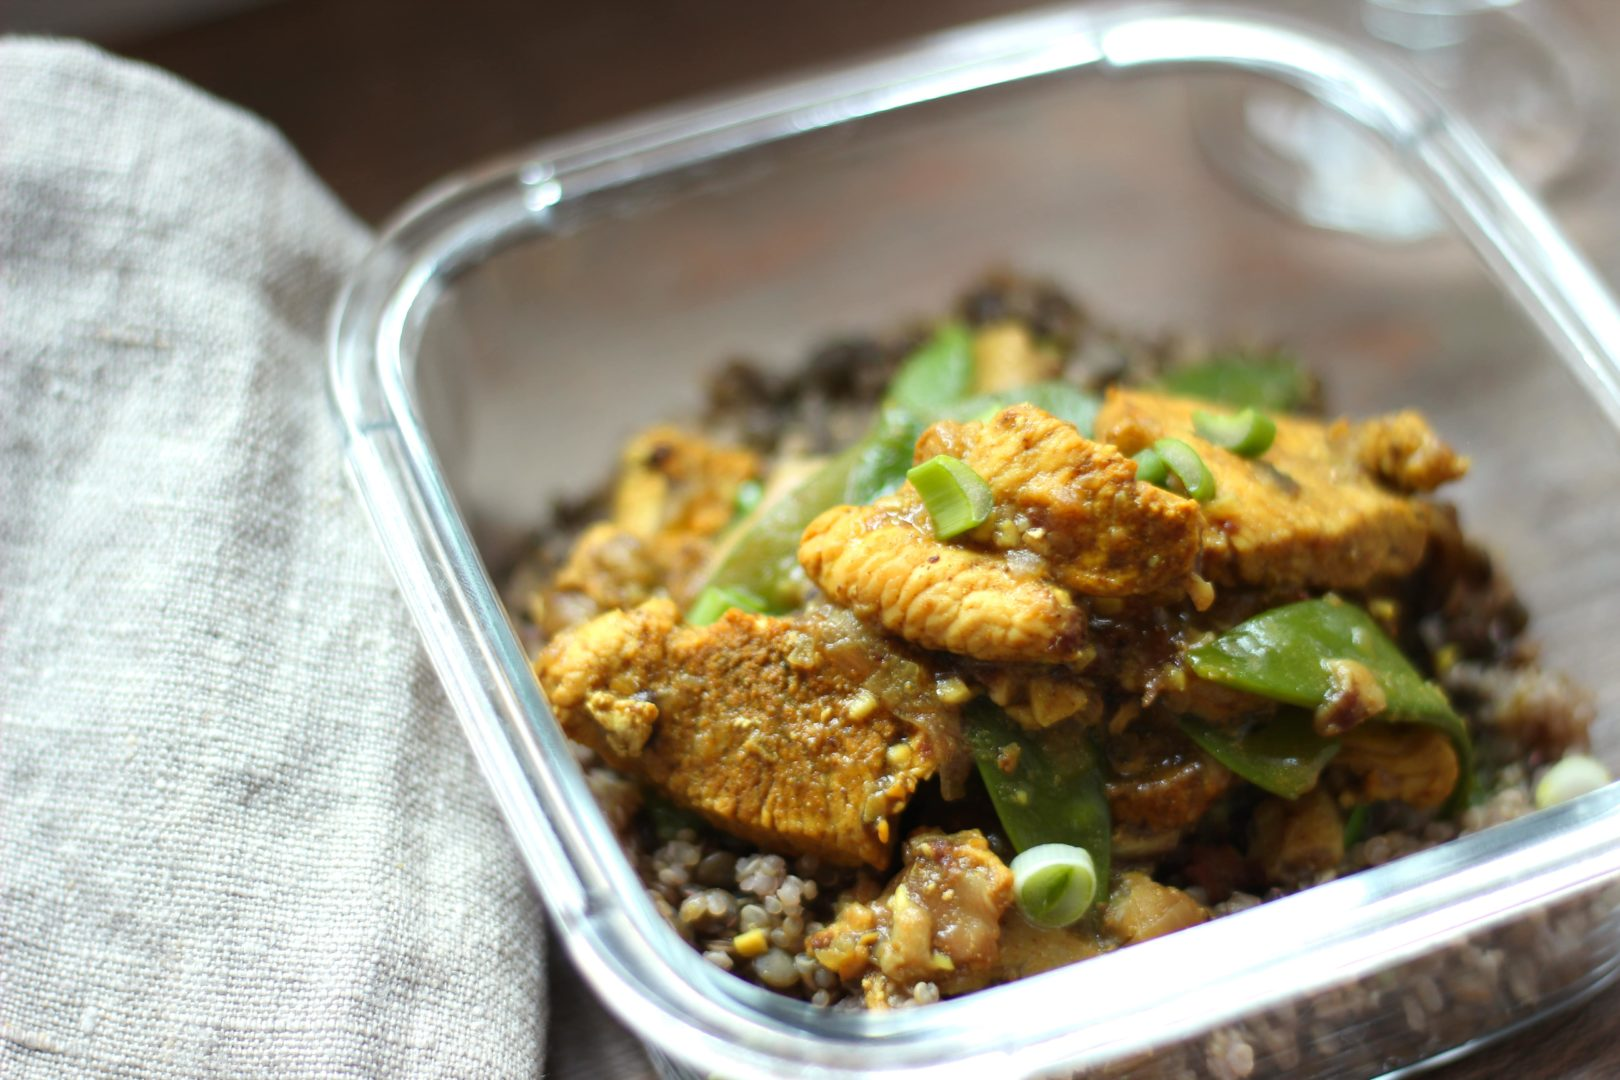 poulet-tikka-pois-gourmands-et-champignons-shiitake